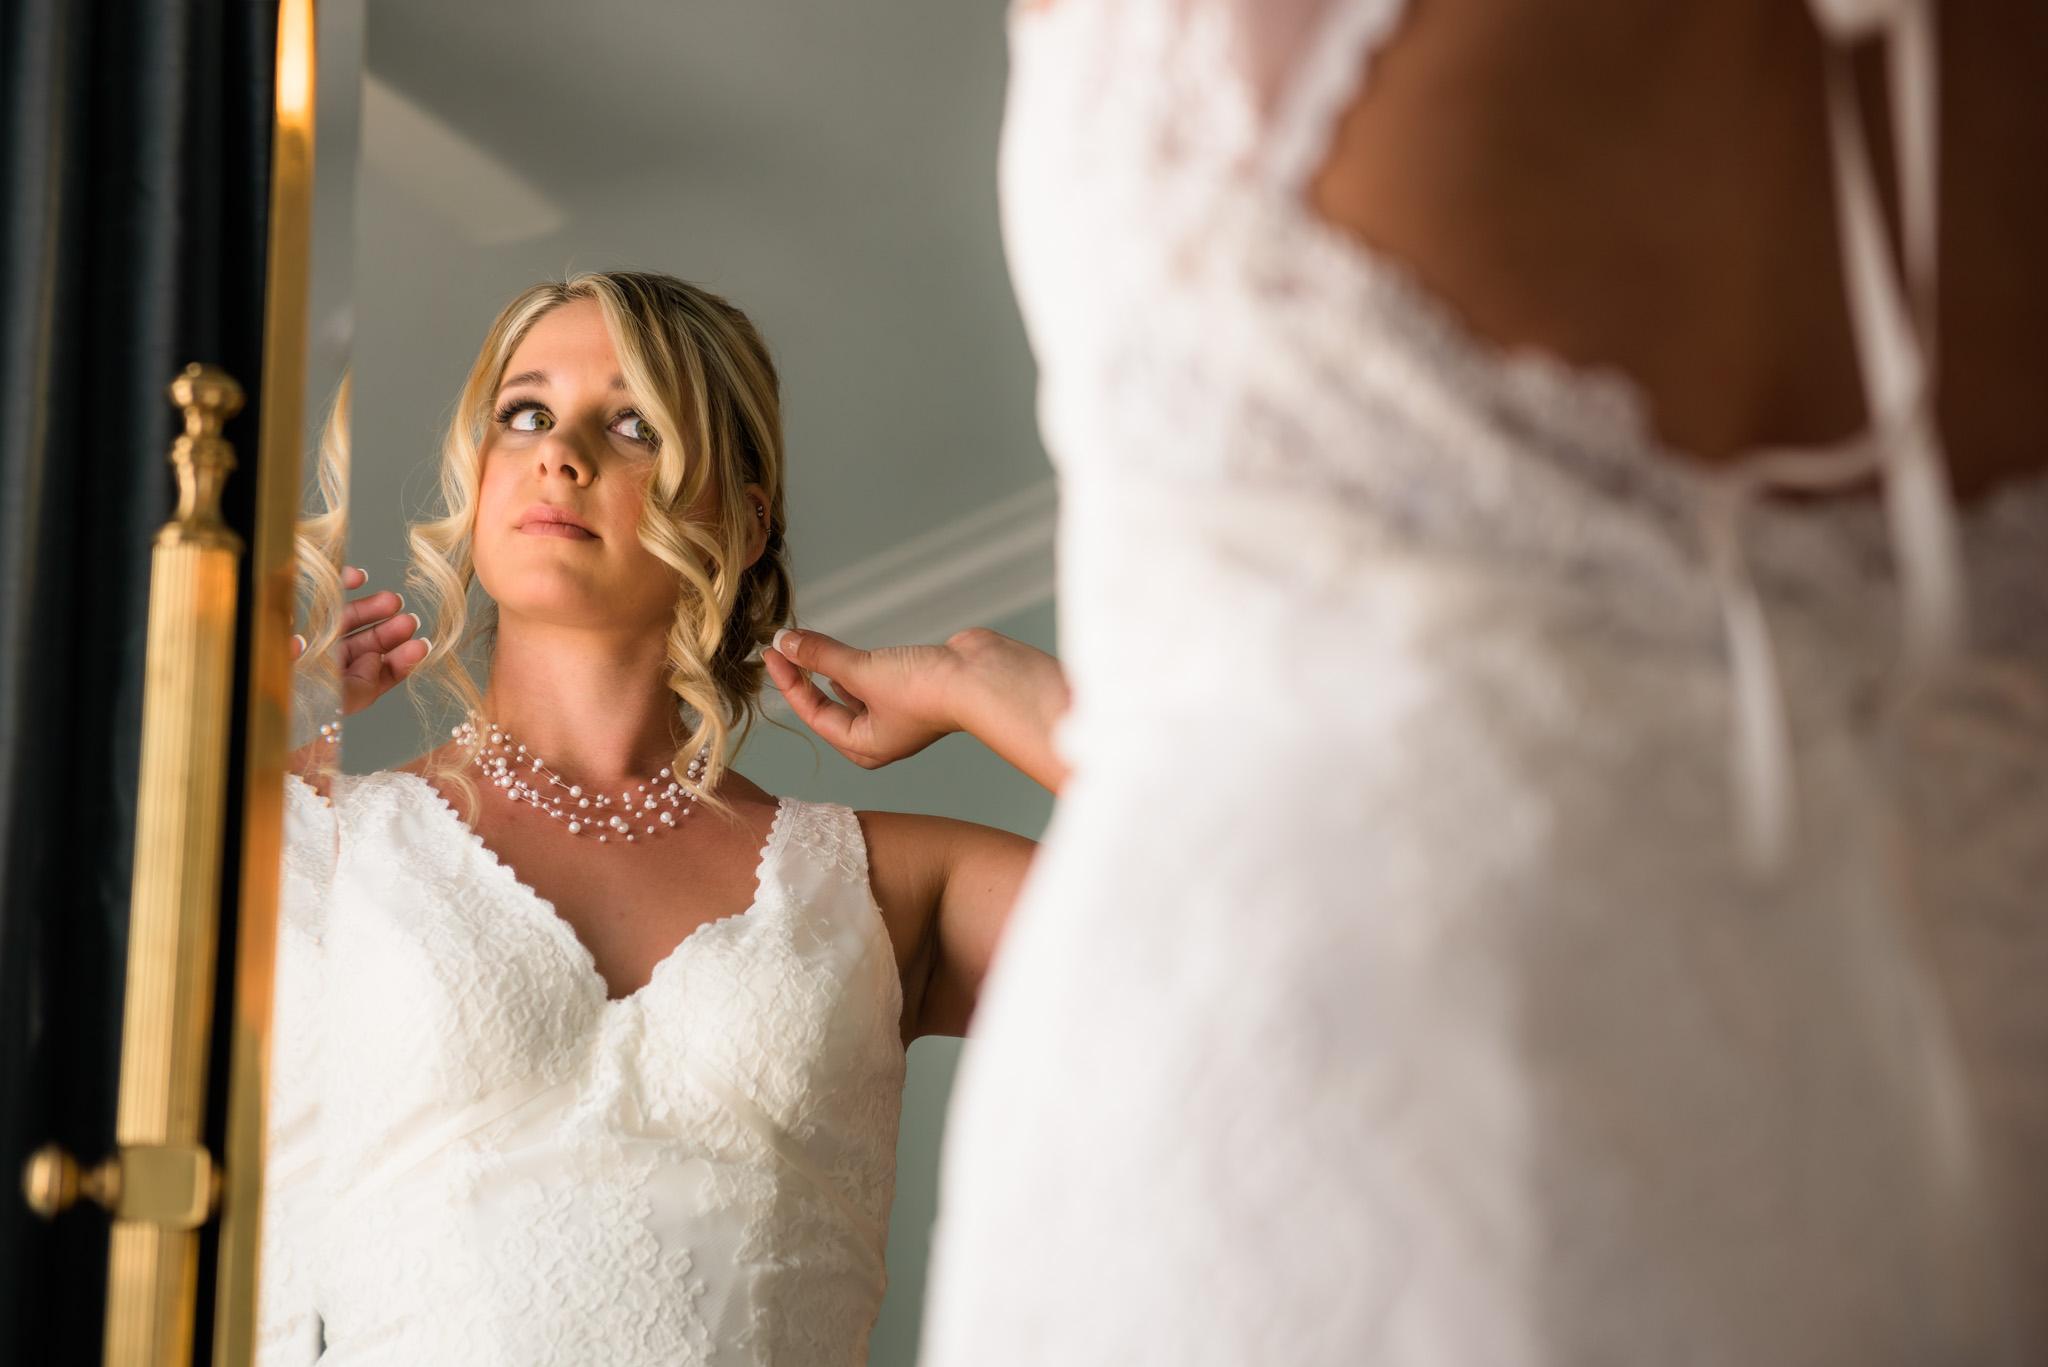 Avensole-Winery-Temecula-Wedding-Josh-and-Olivia-3108.JPG